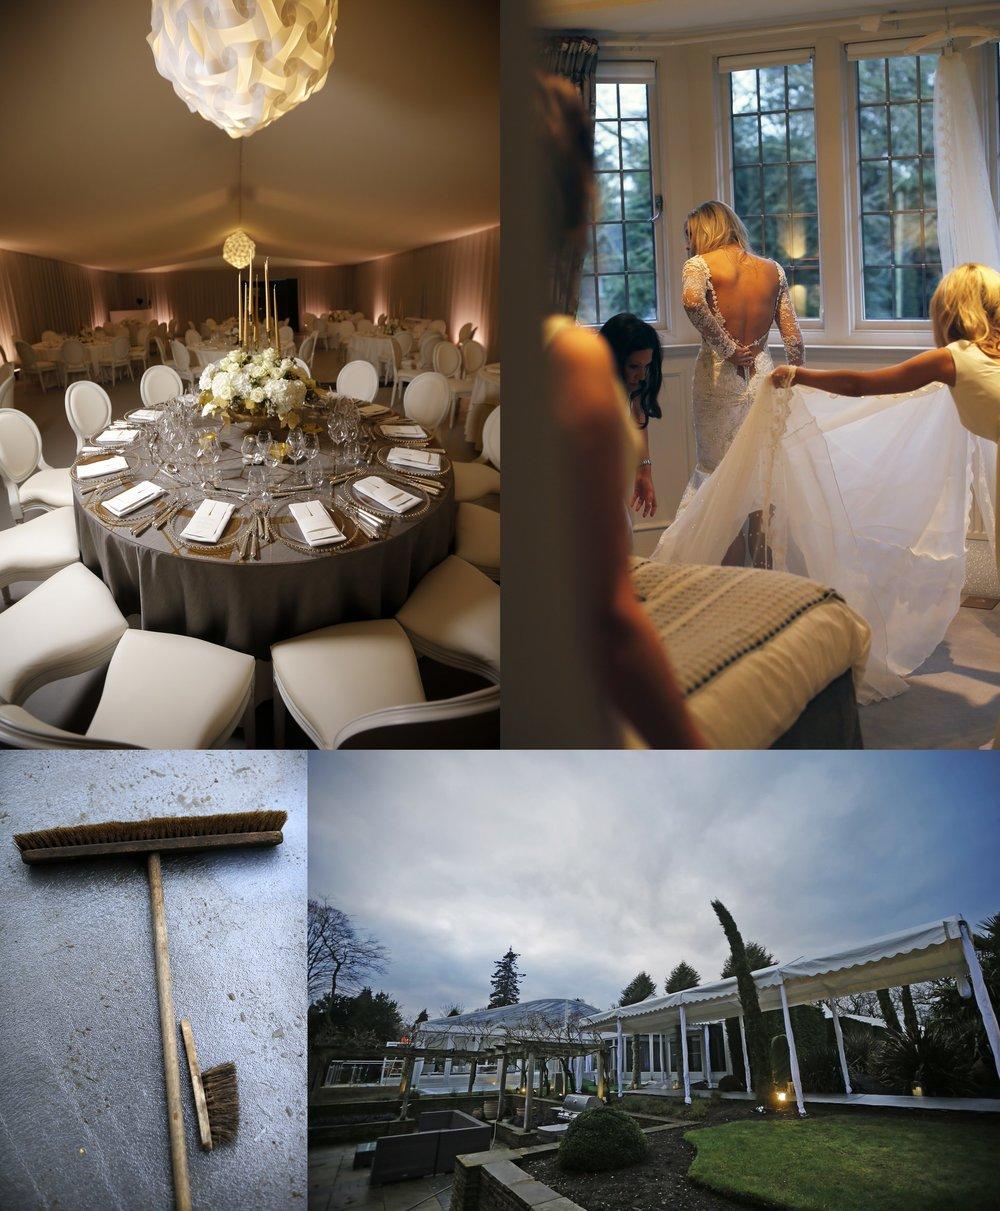 brett-harkness-winter-wedding-uk-wedding-photographer_0007.jpg